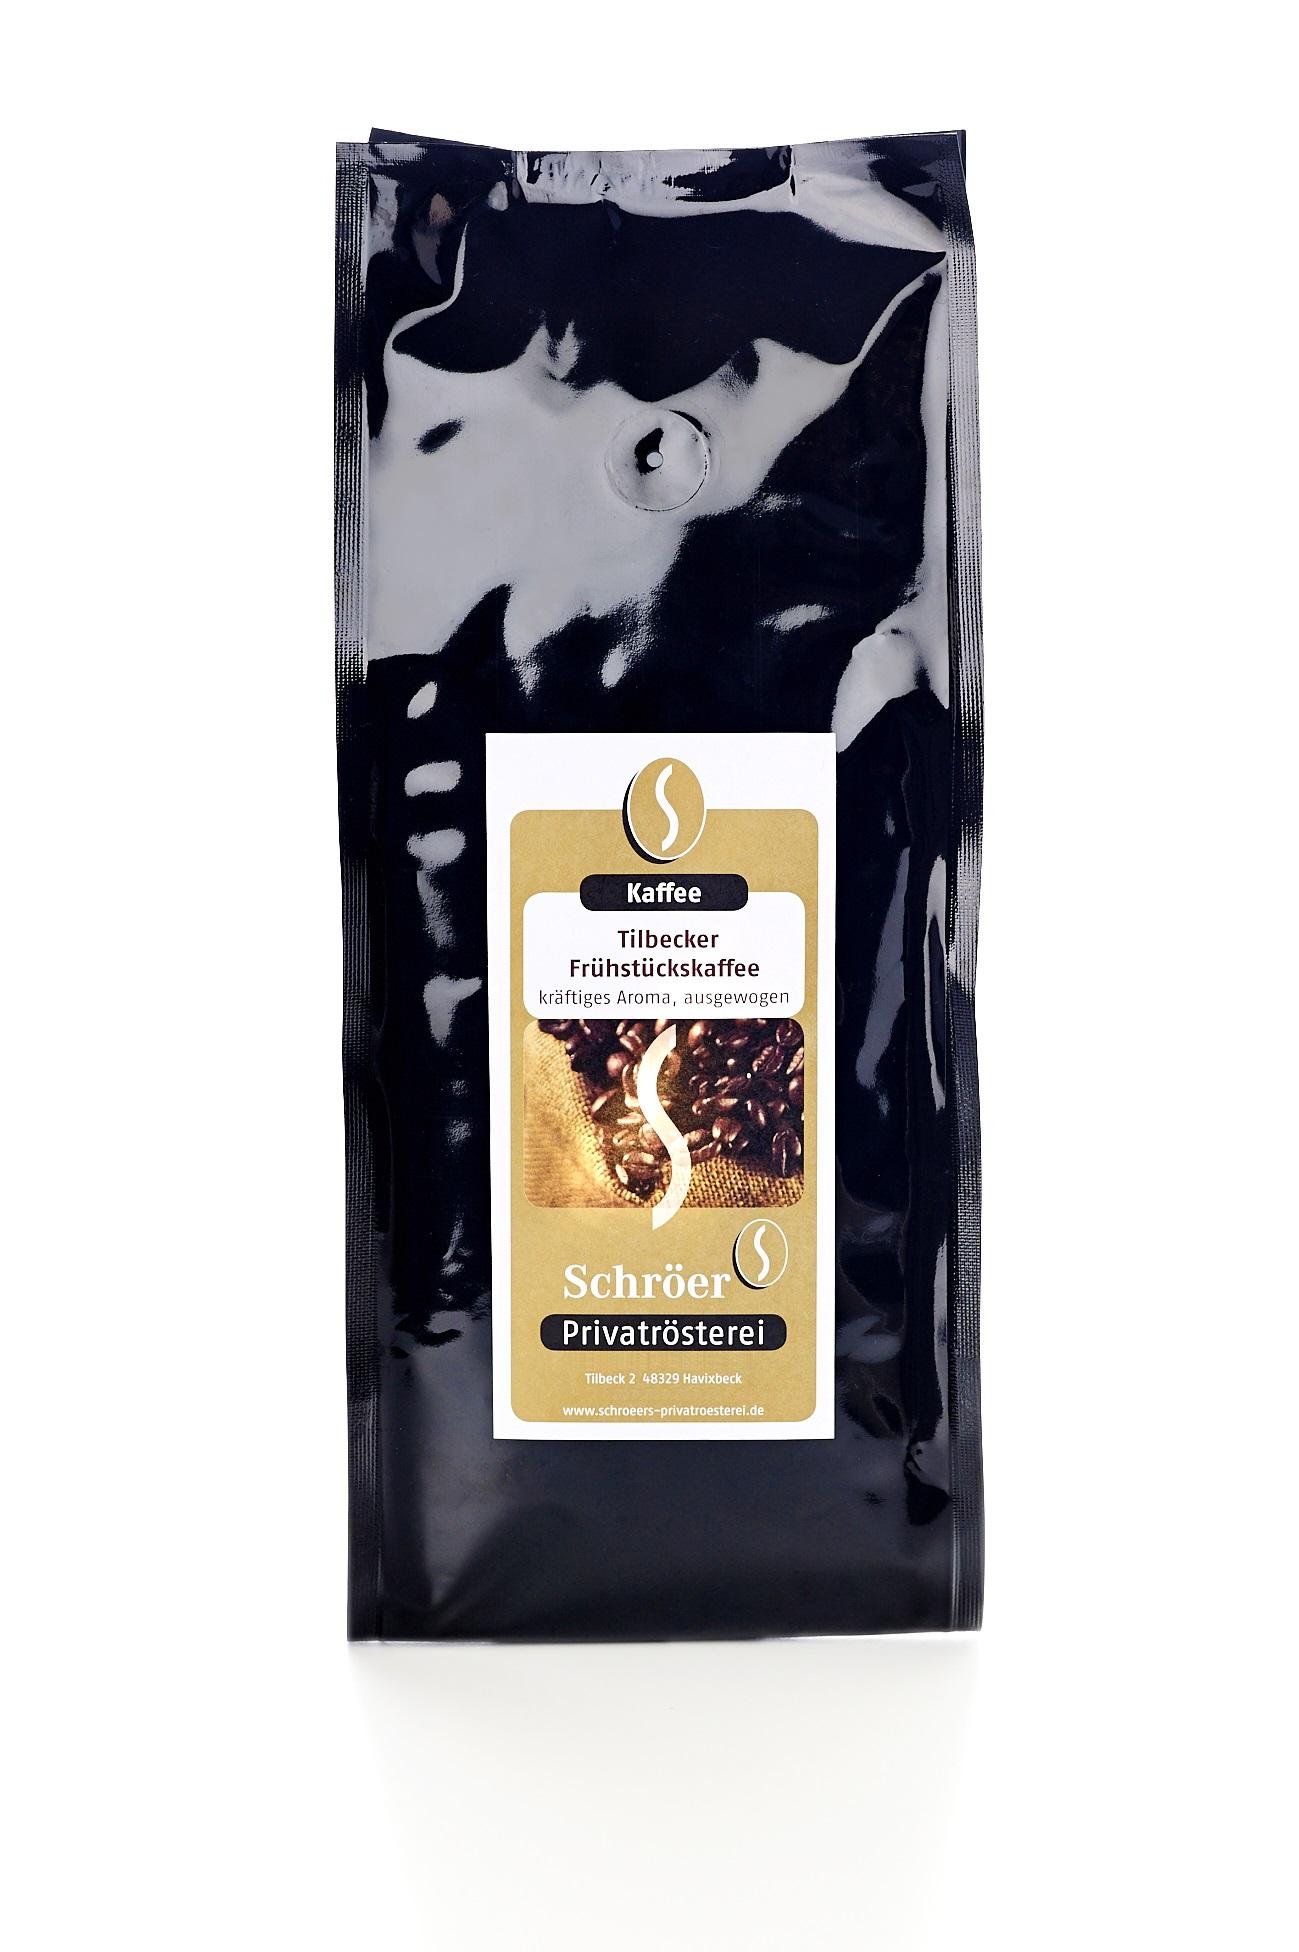 Tilbecker Frühstückskaffee